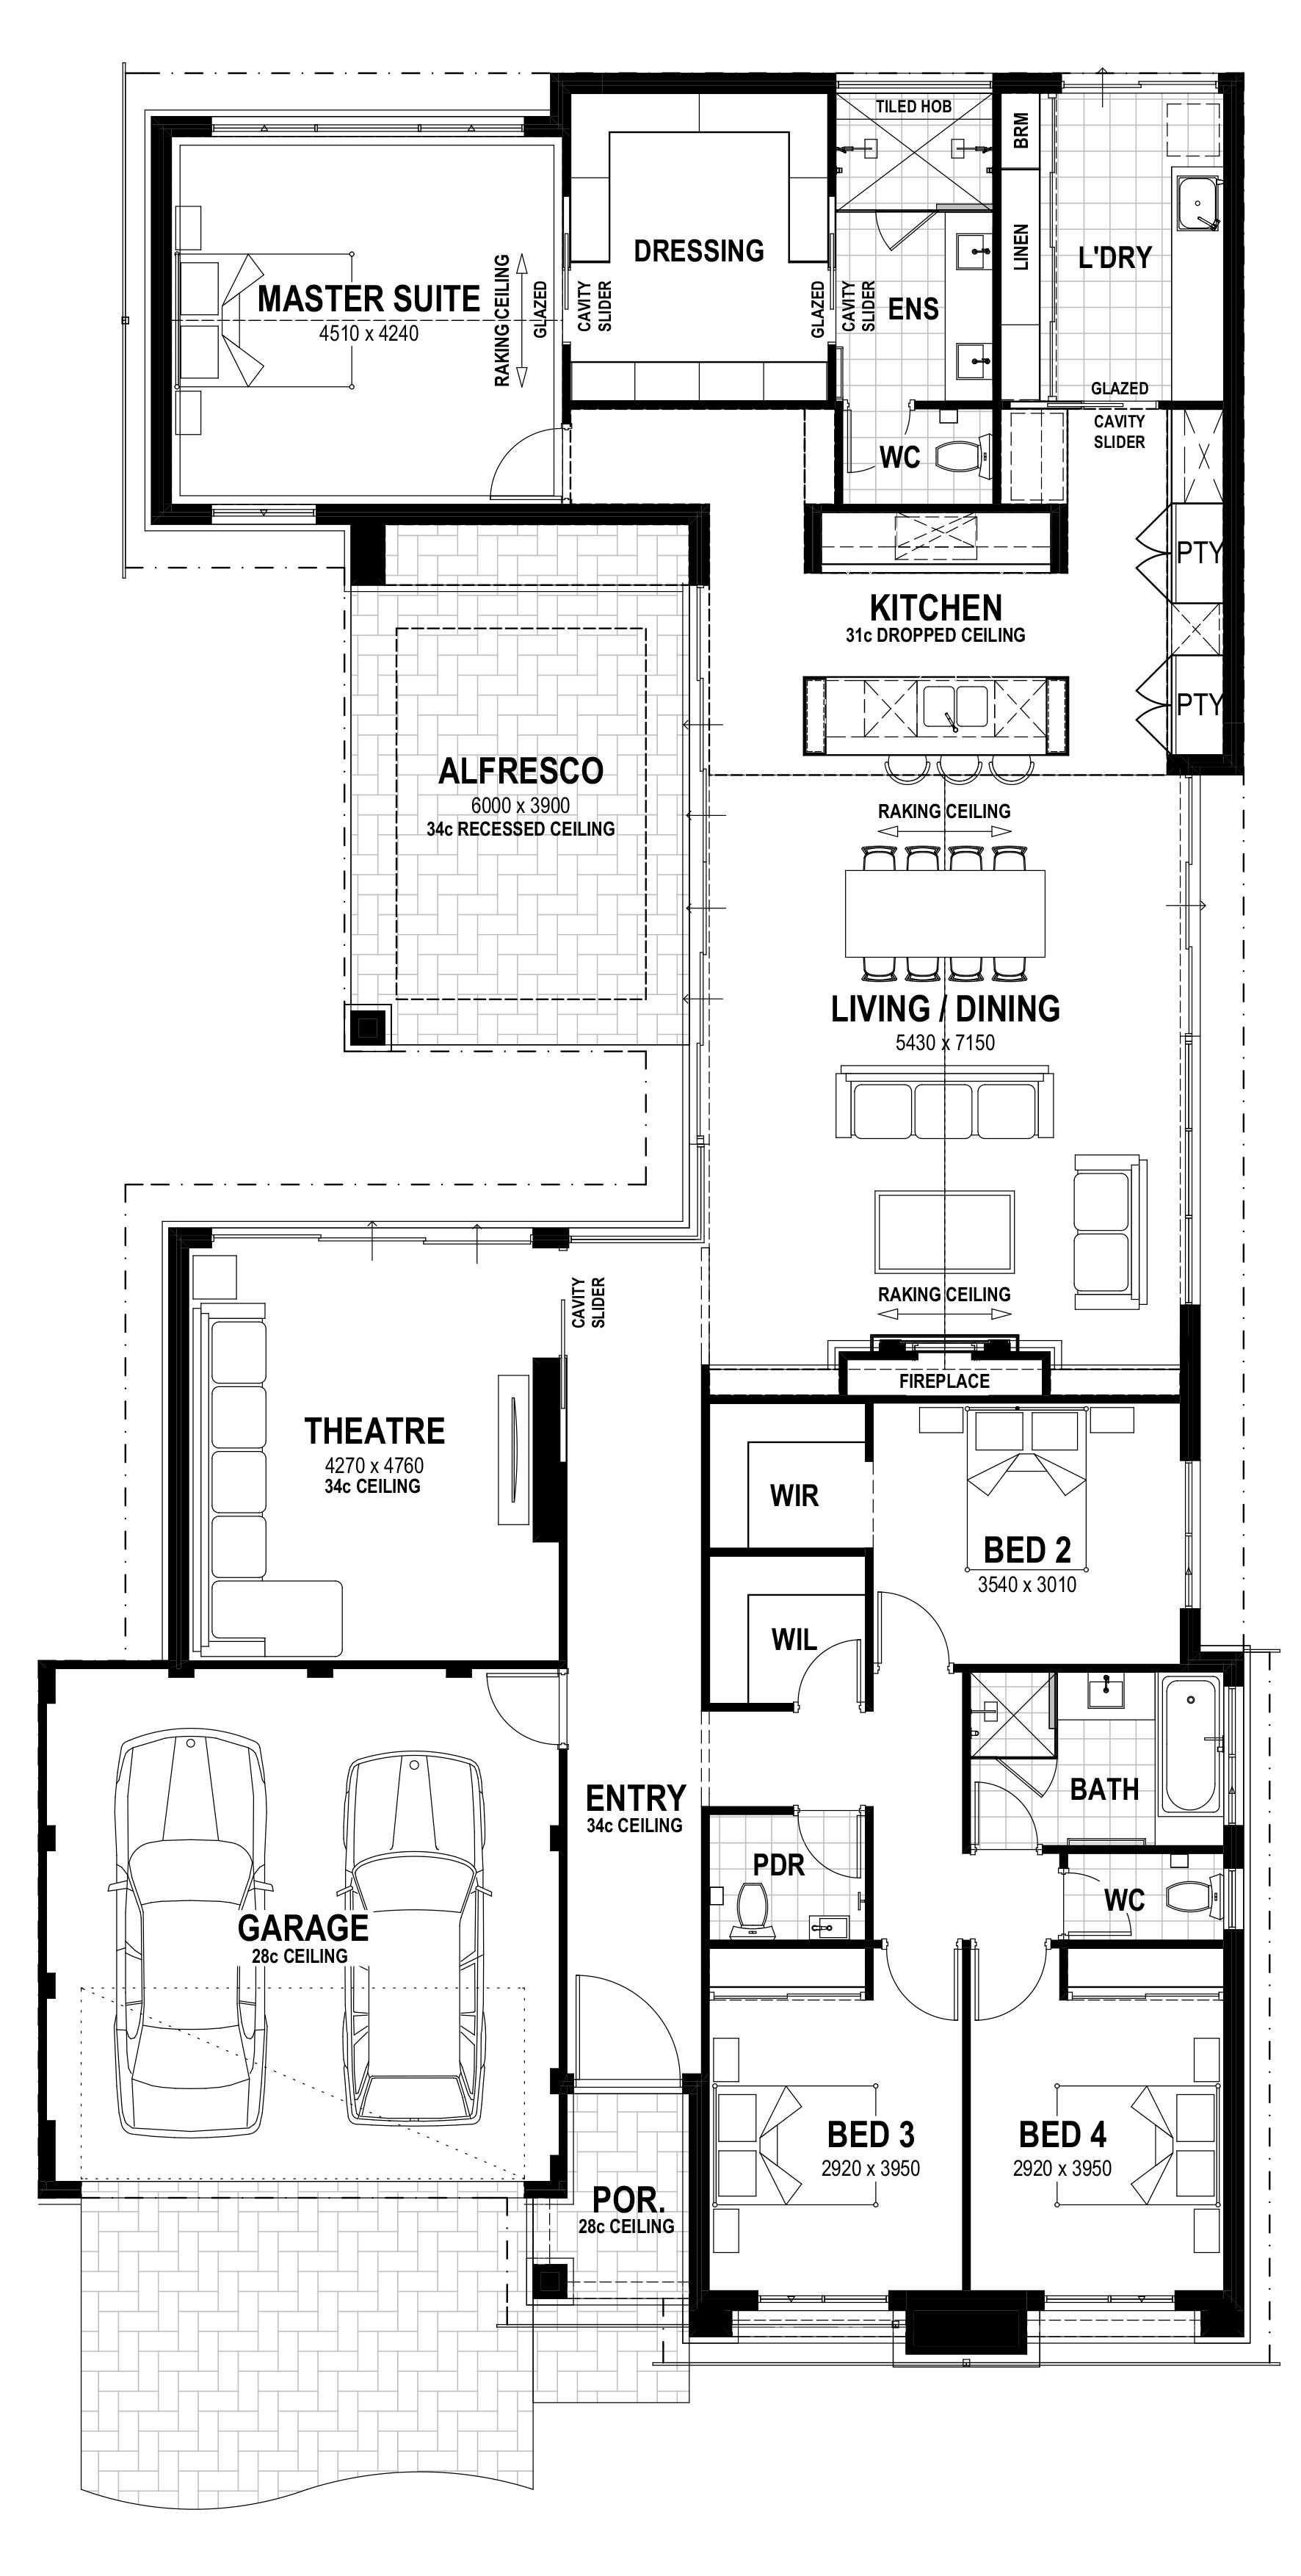 Manor Lot 15 Pallium Way Floorplan Home Design Floor Plans Dream House Plans Floor Plans